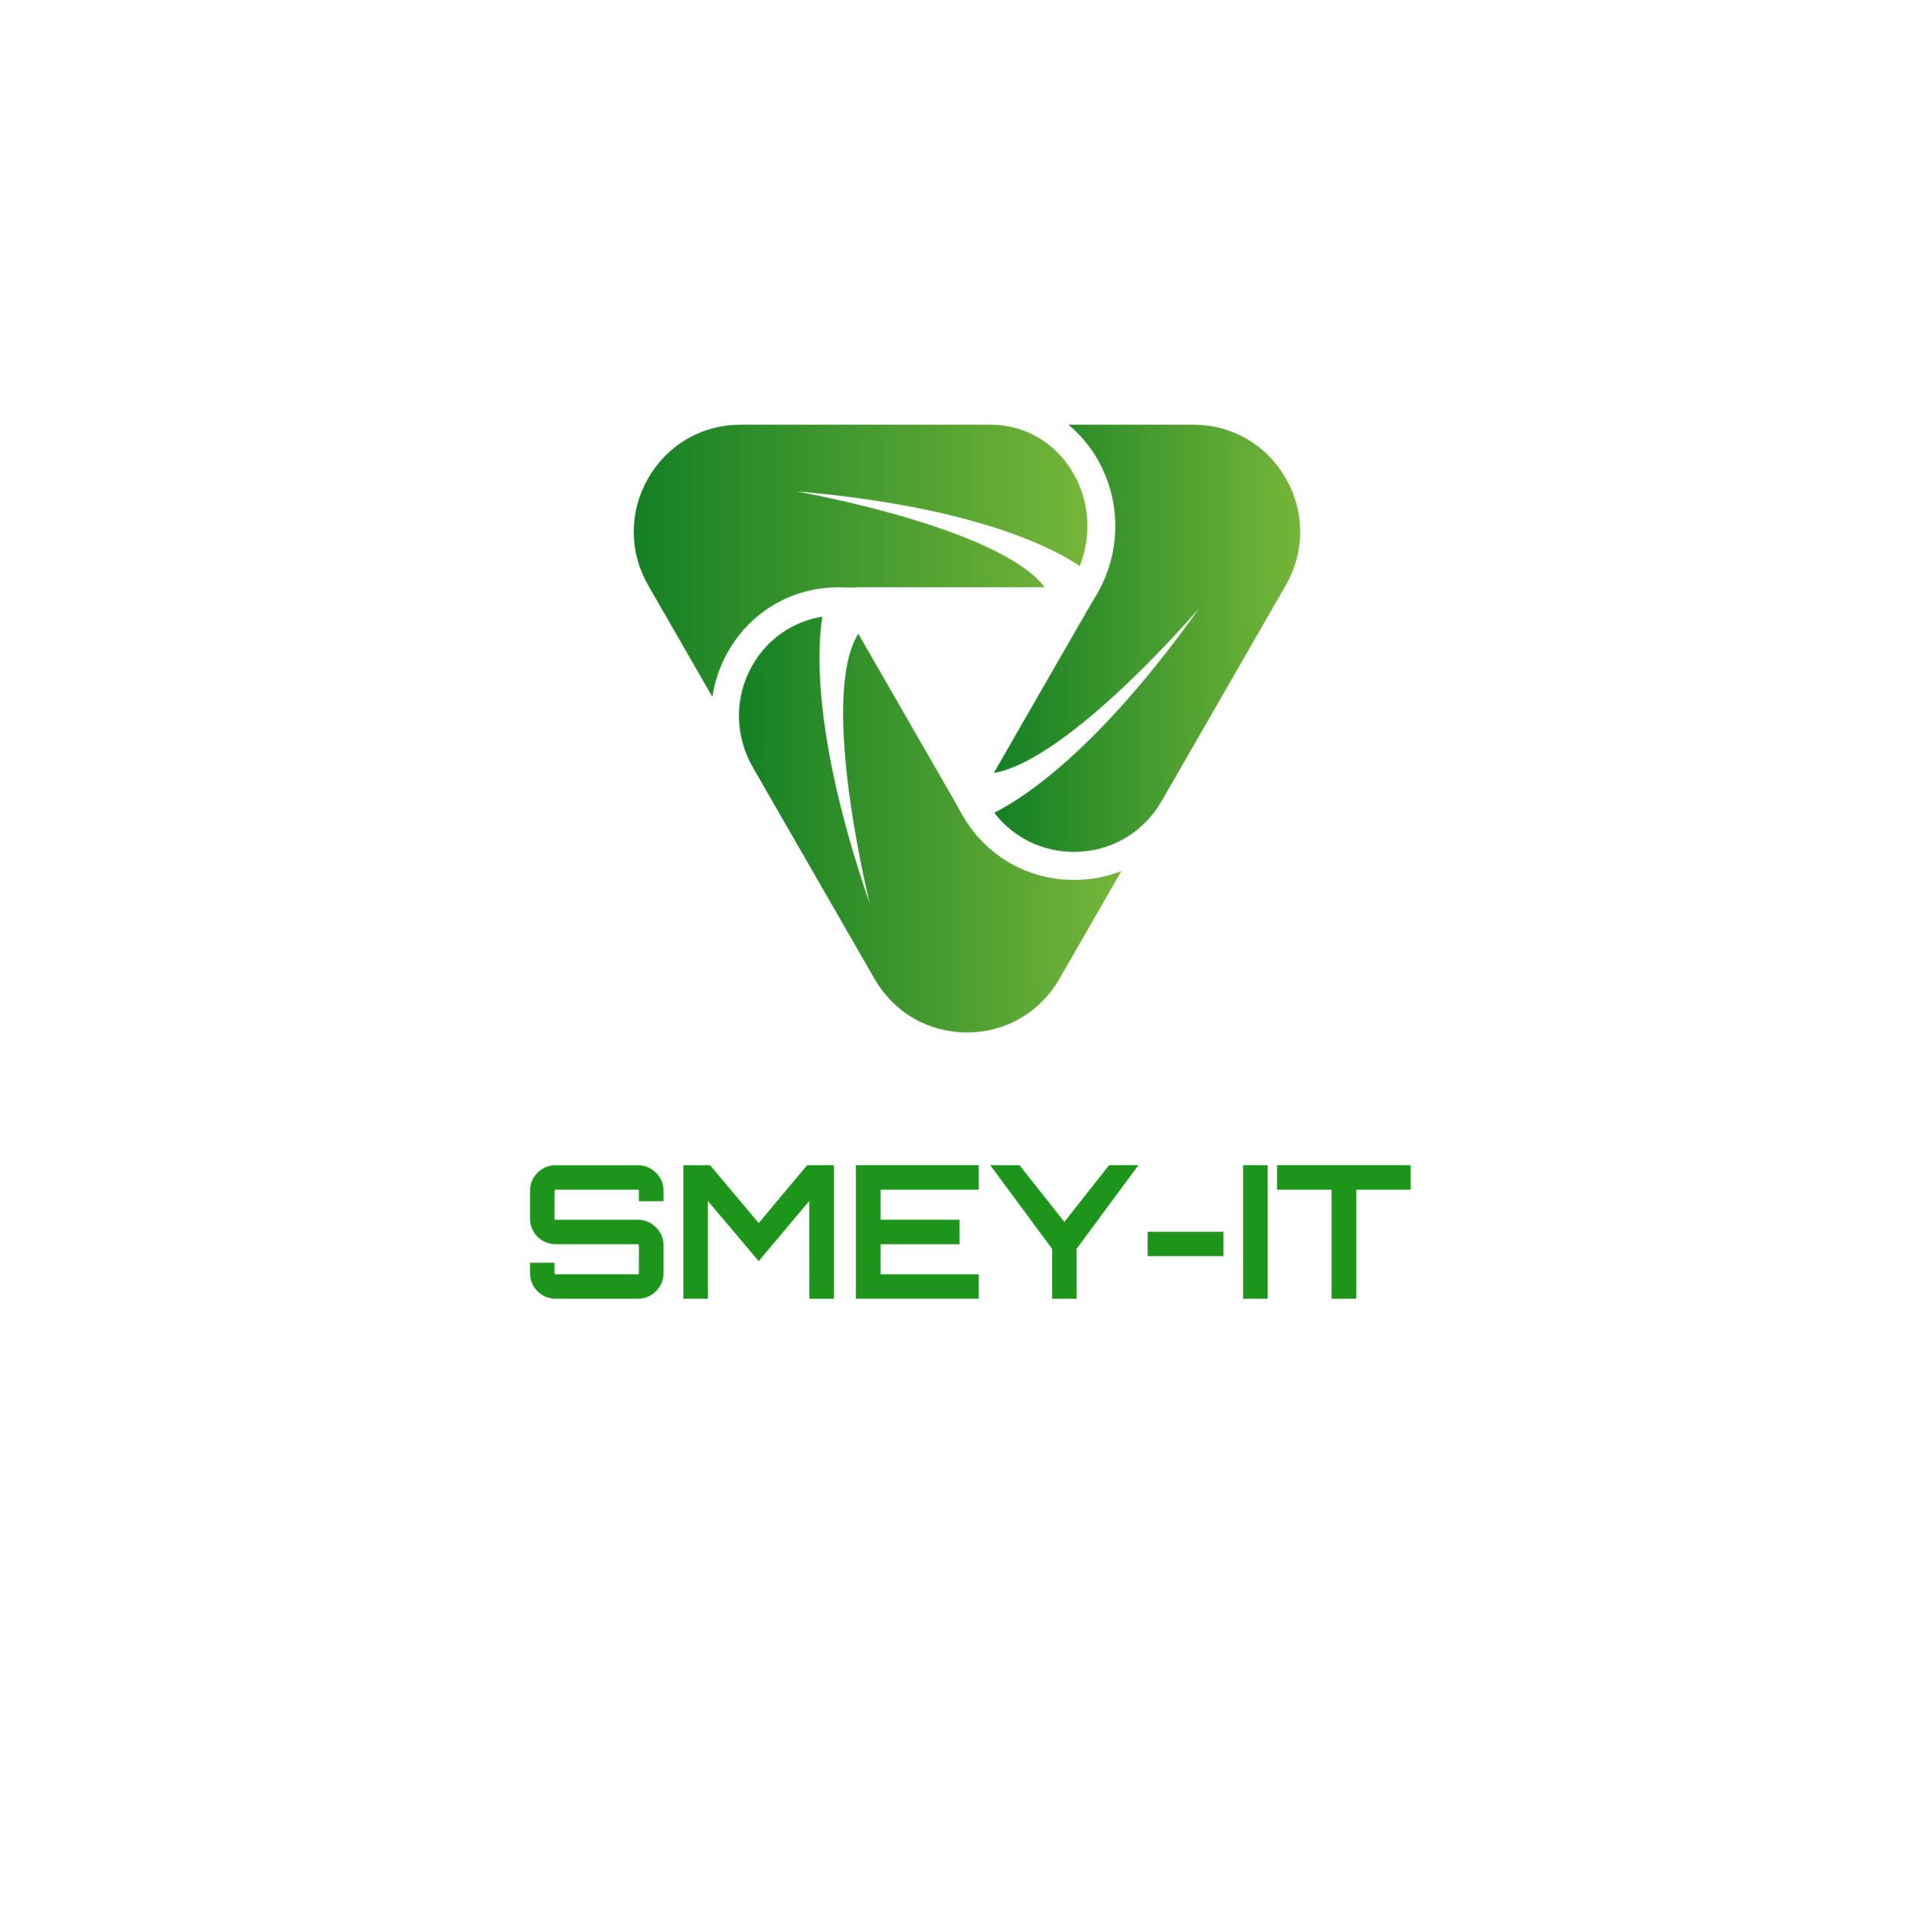 smey-IT - Stephan Meyer